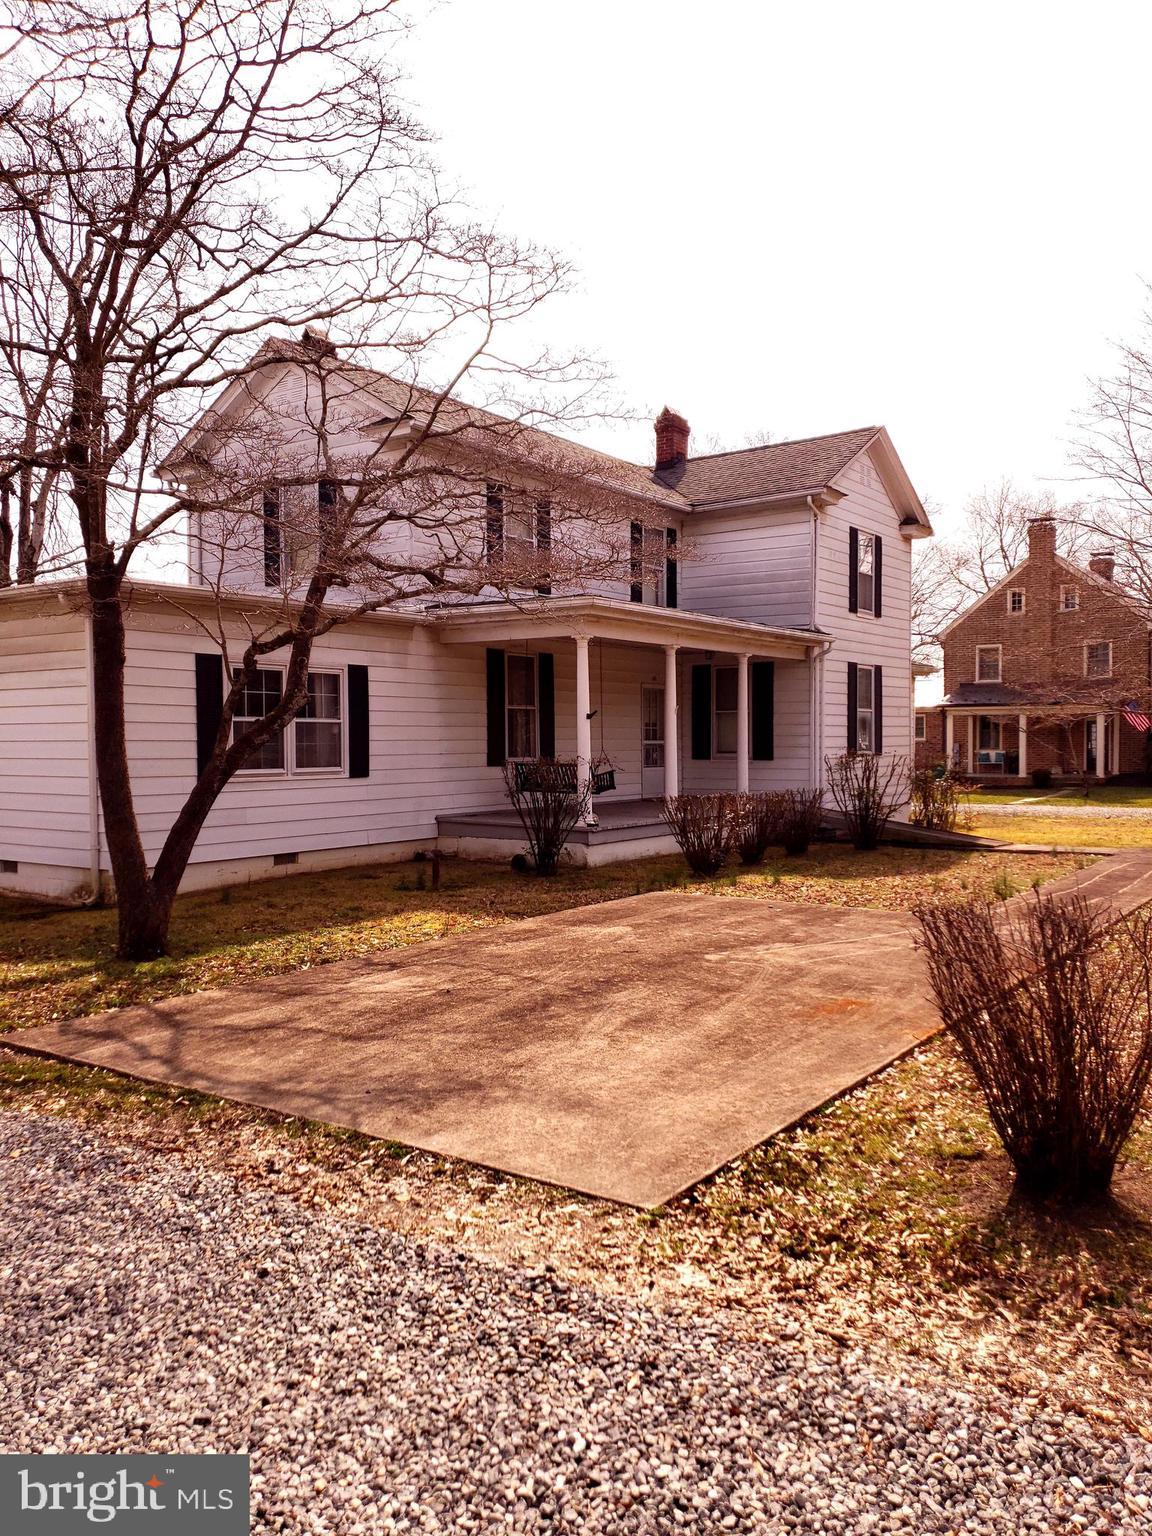 141 S MAIN STREET, BOWLING GREEN, VA 22427